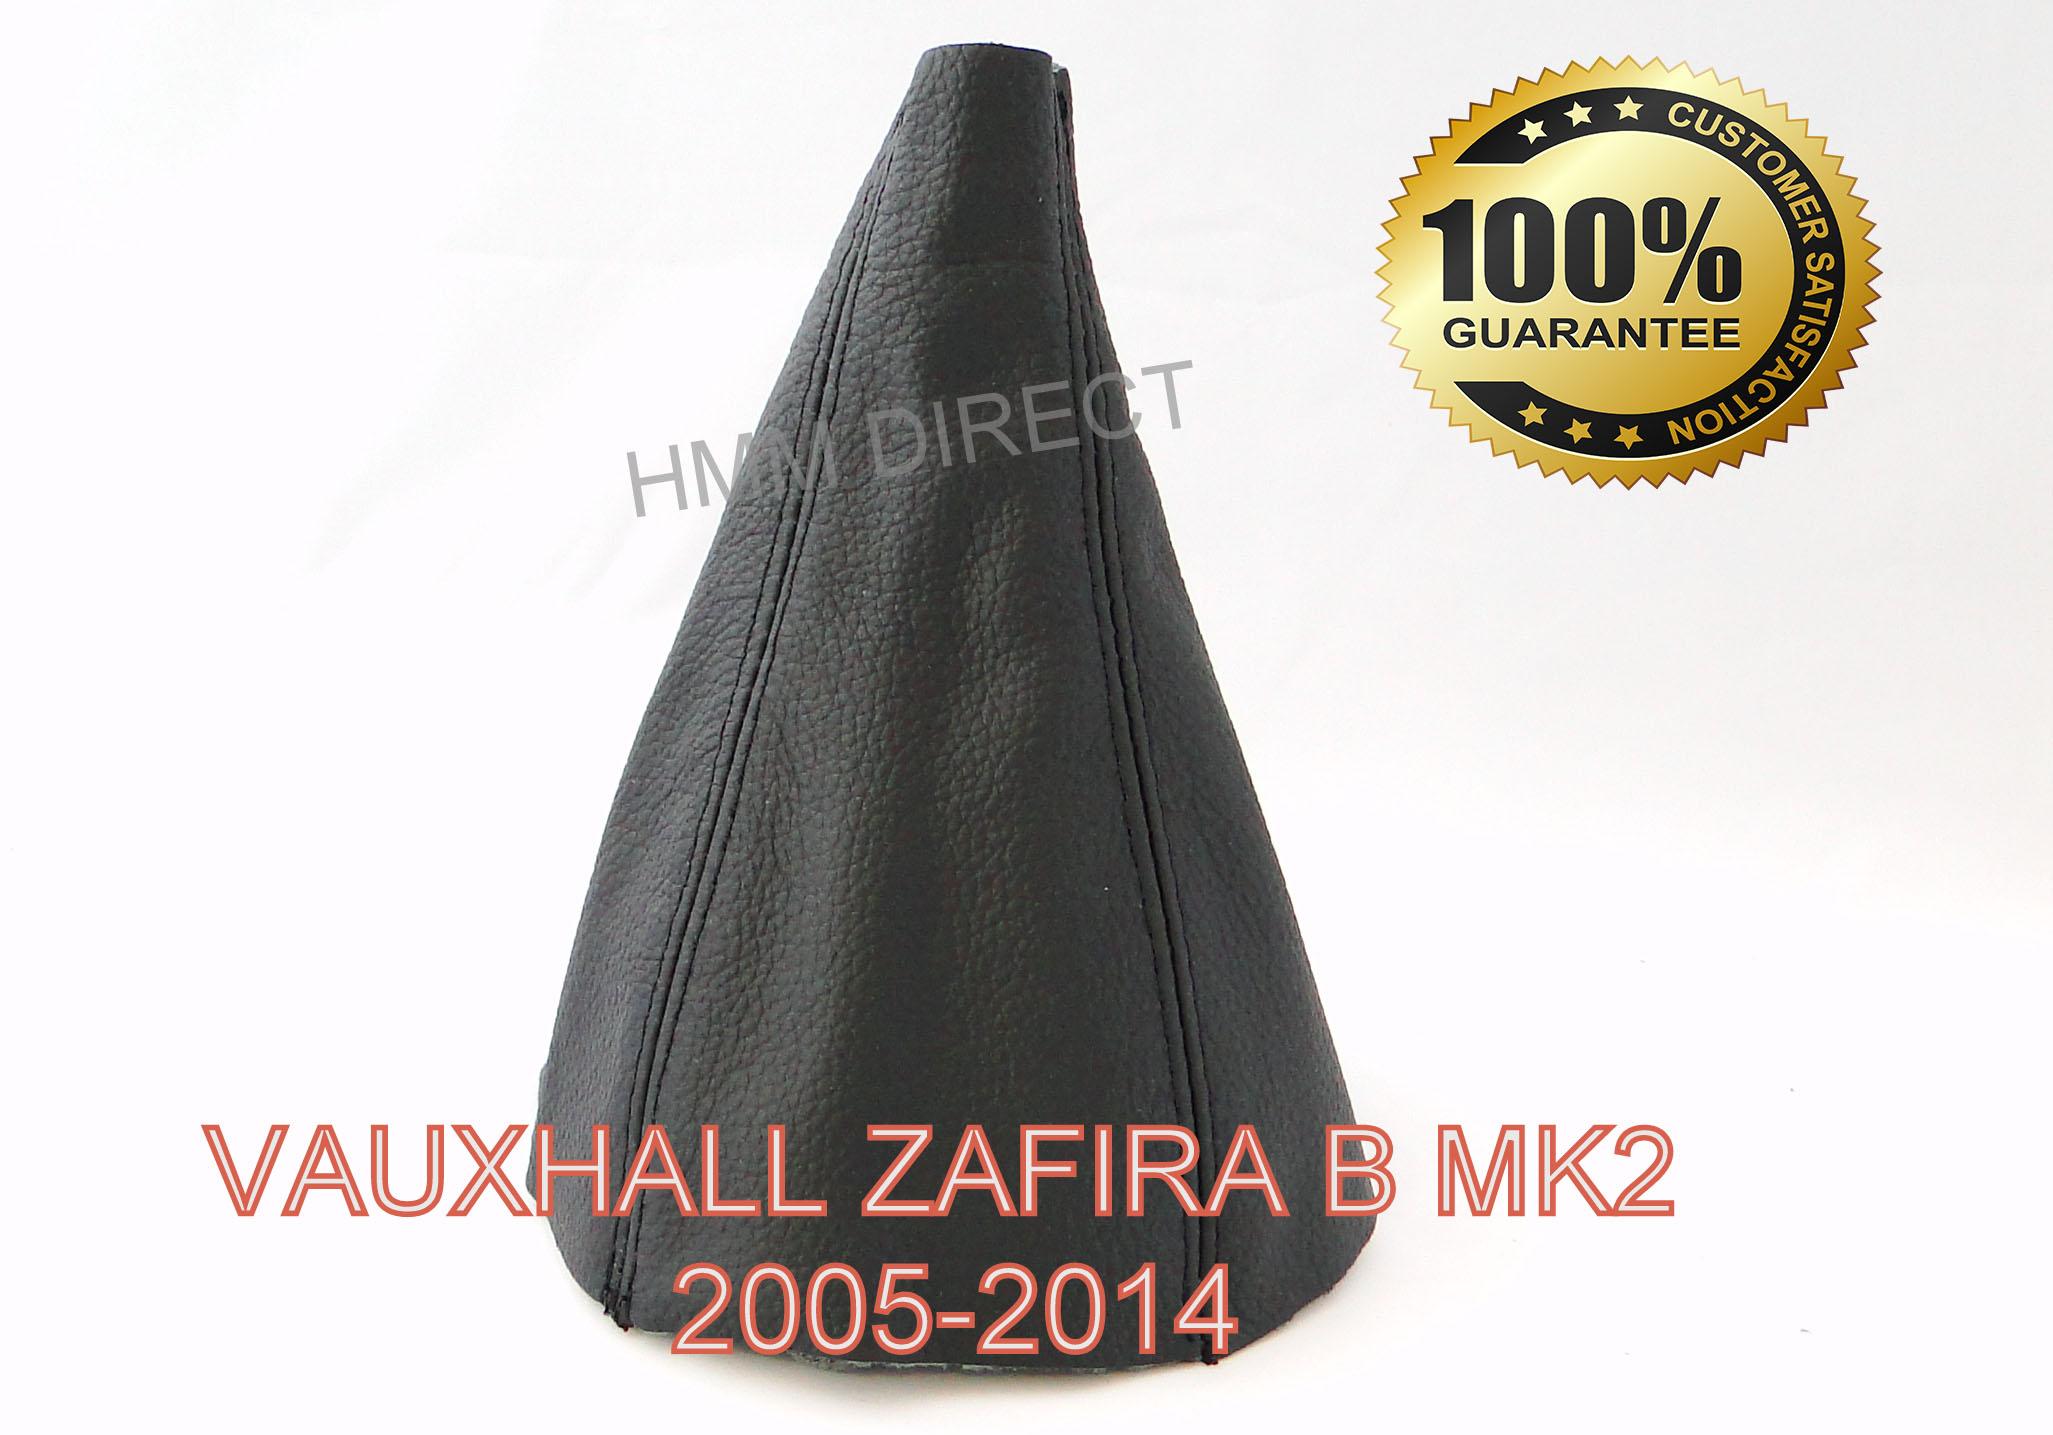 VAUXHALL ZAFIRA B MK2 2005-2014 GENUINE LEATHER GEAR GAITER-White Stitch